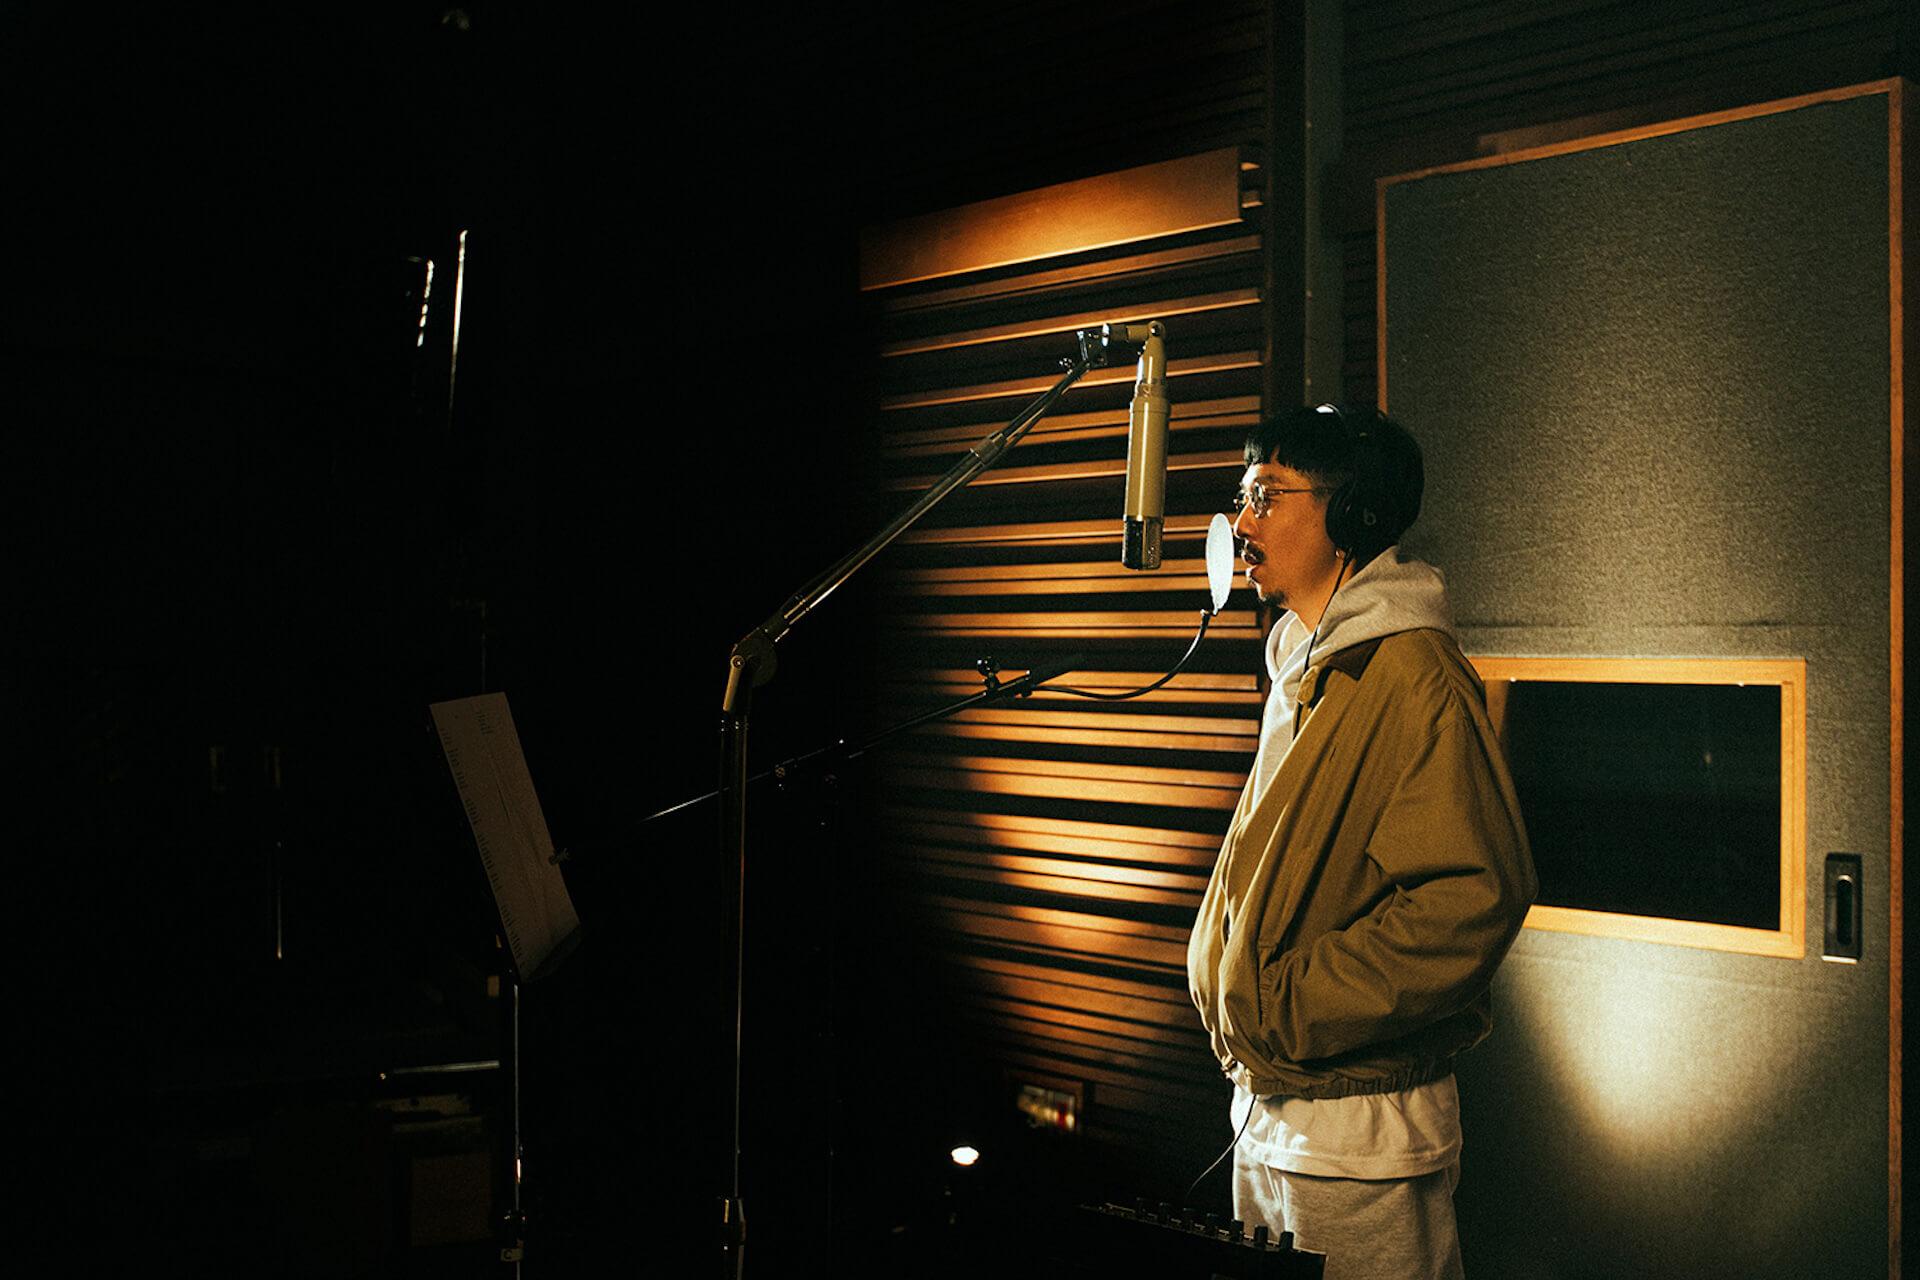 NulbarichがBeats by Dr. Dreの人気ドキュメンタリー「Beat x Beat」に登場!監督は木村太一 music210514_nulbarich_beats_4